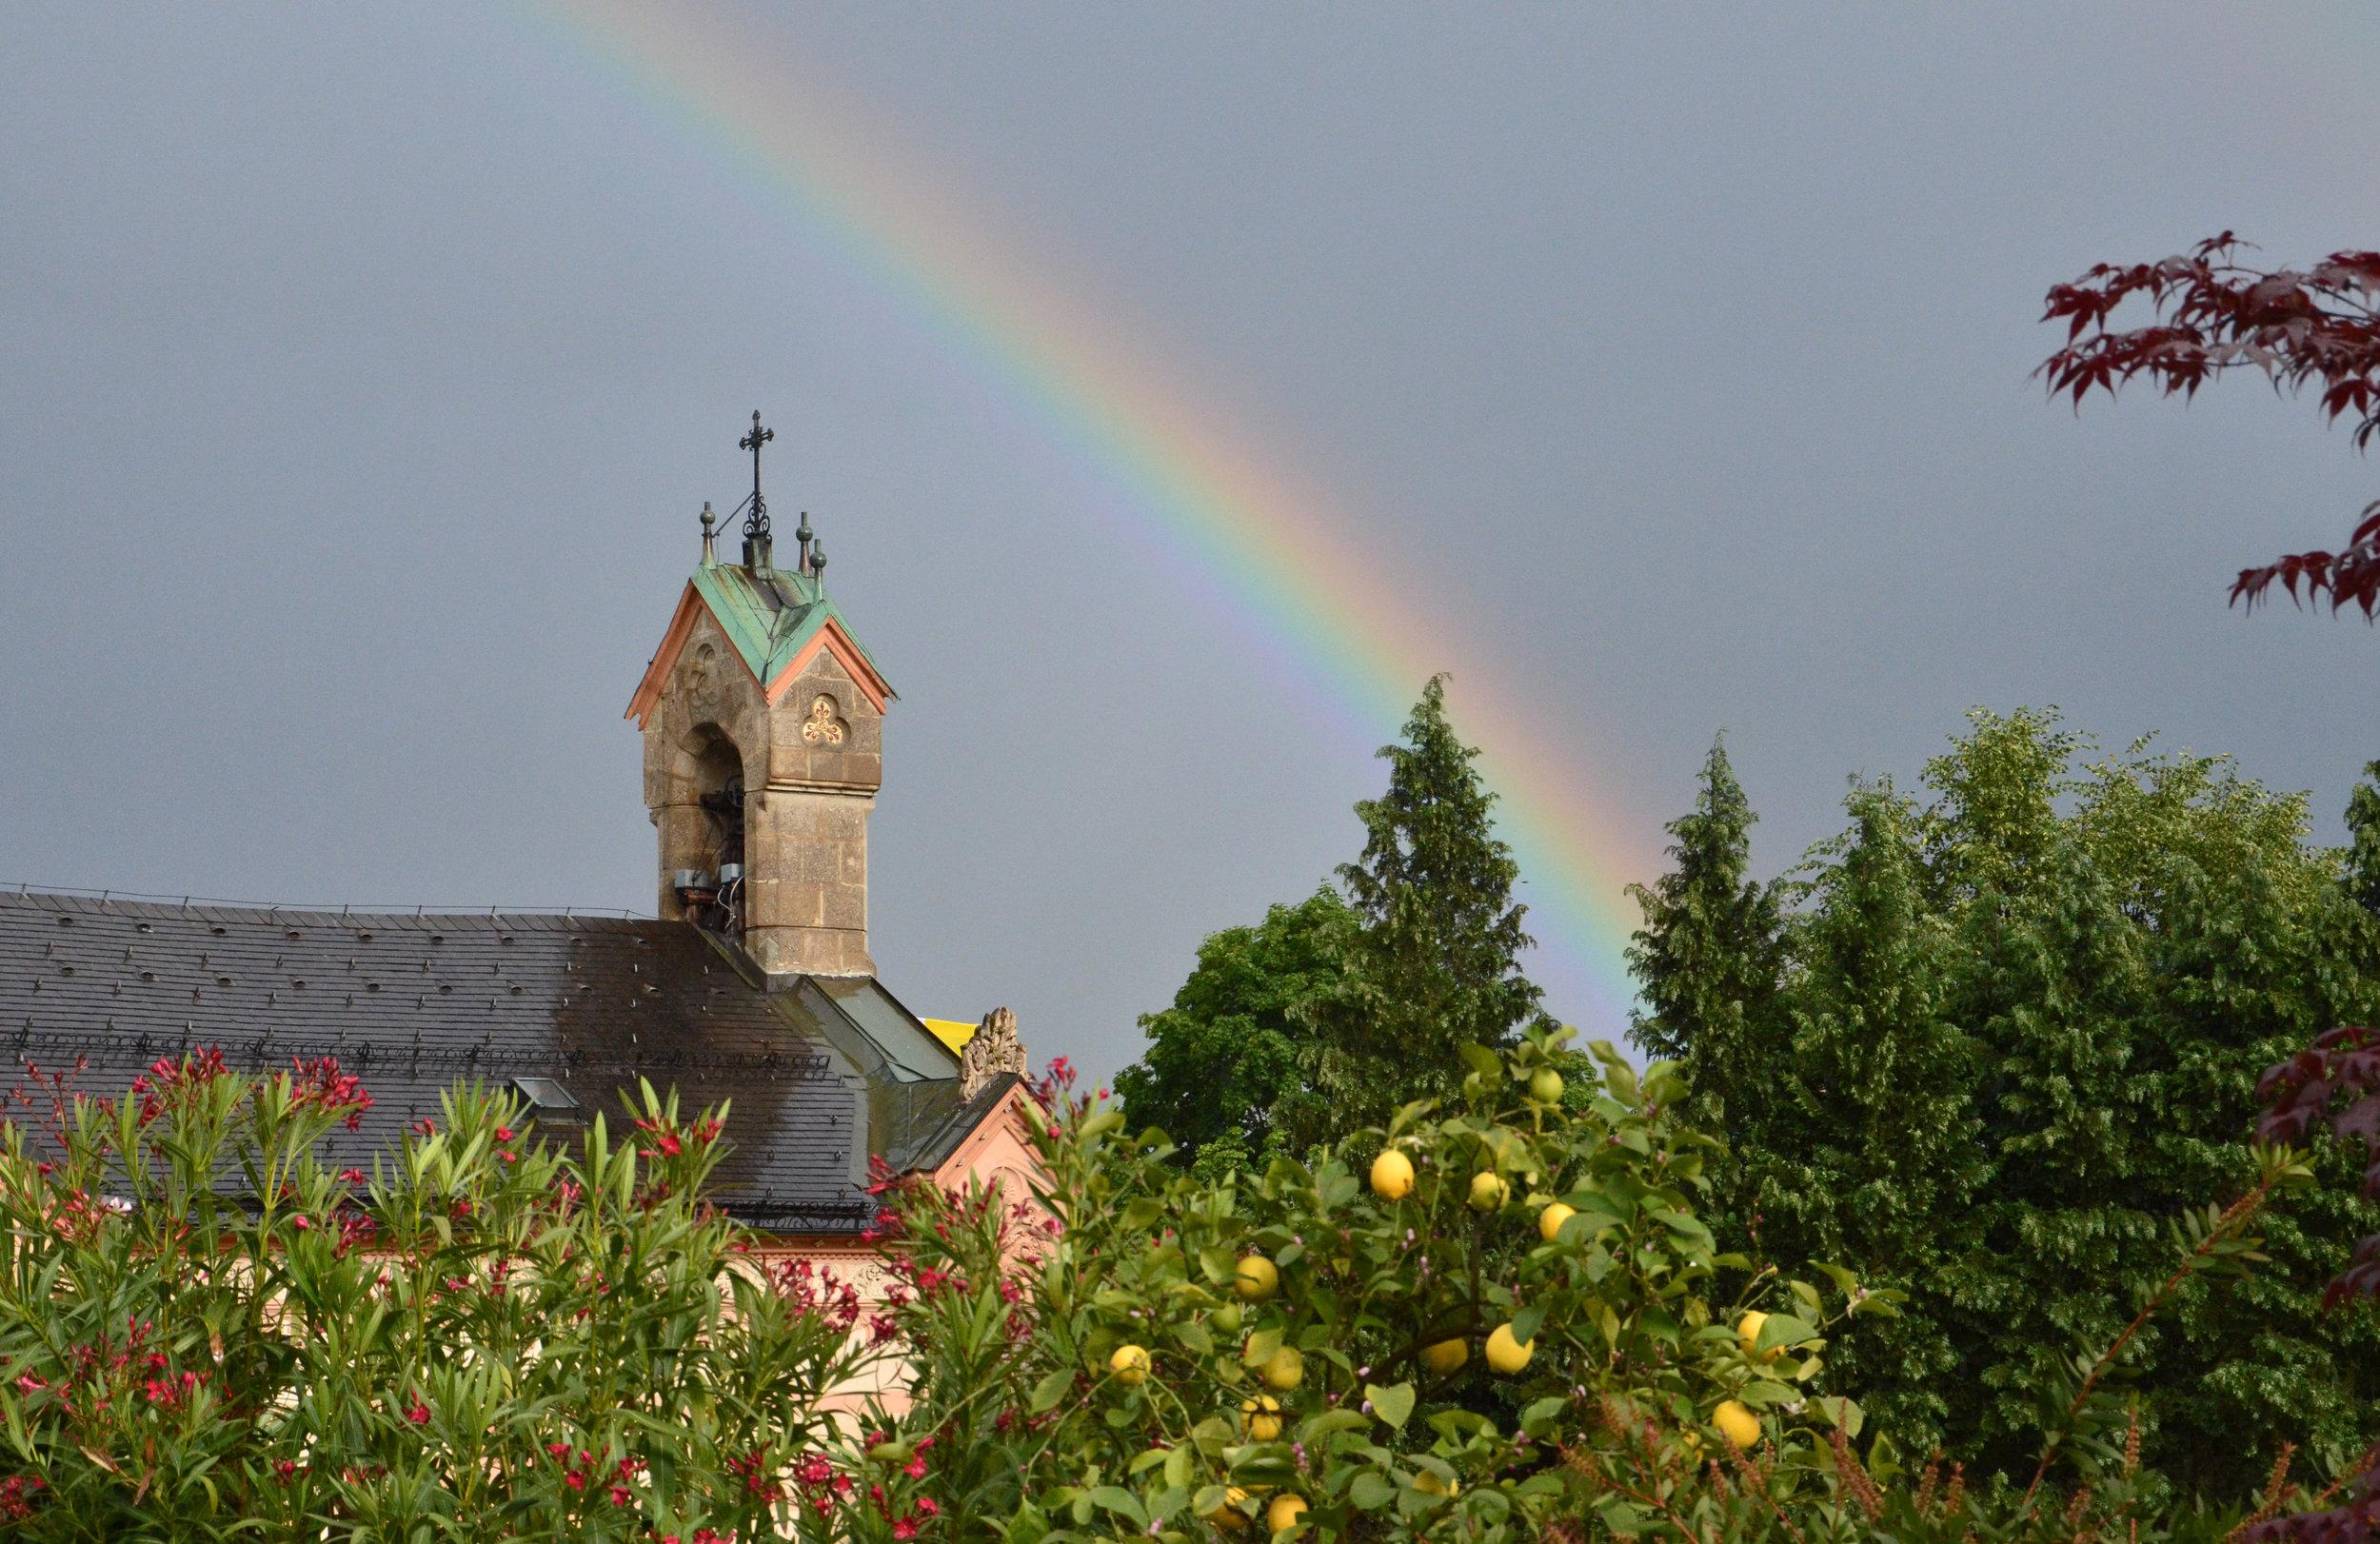 Regenbogen über der Kirche.JPG